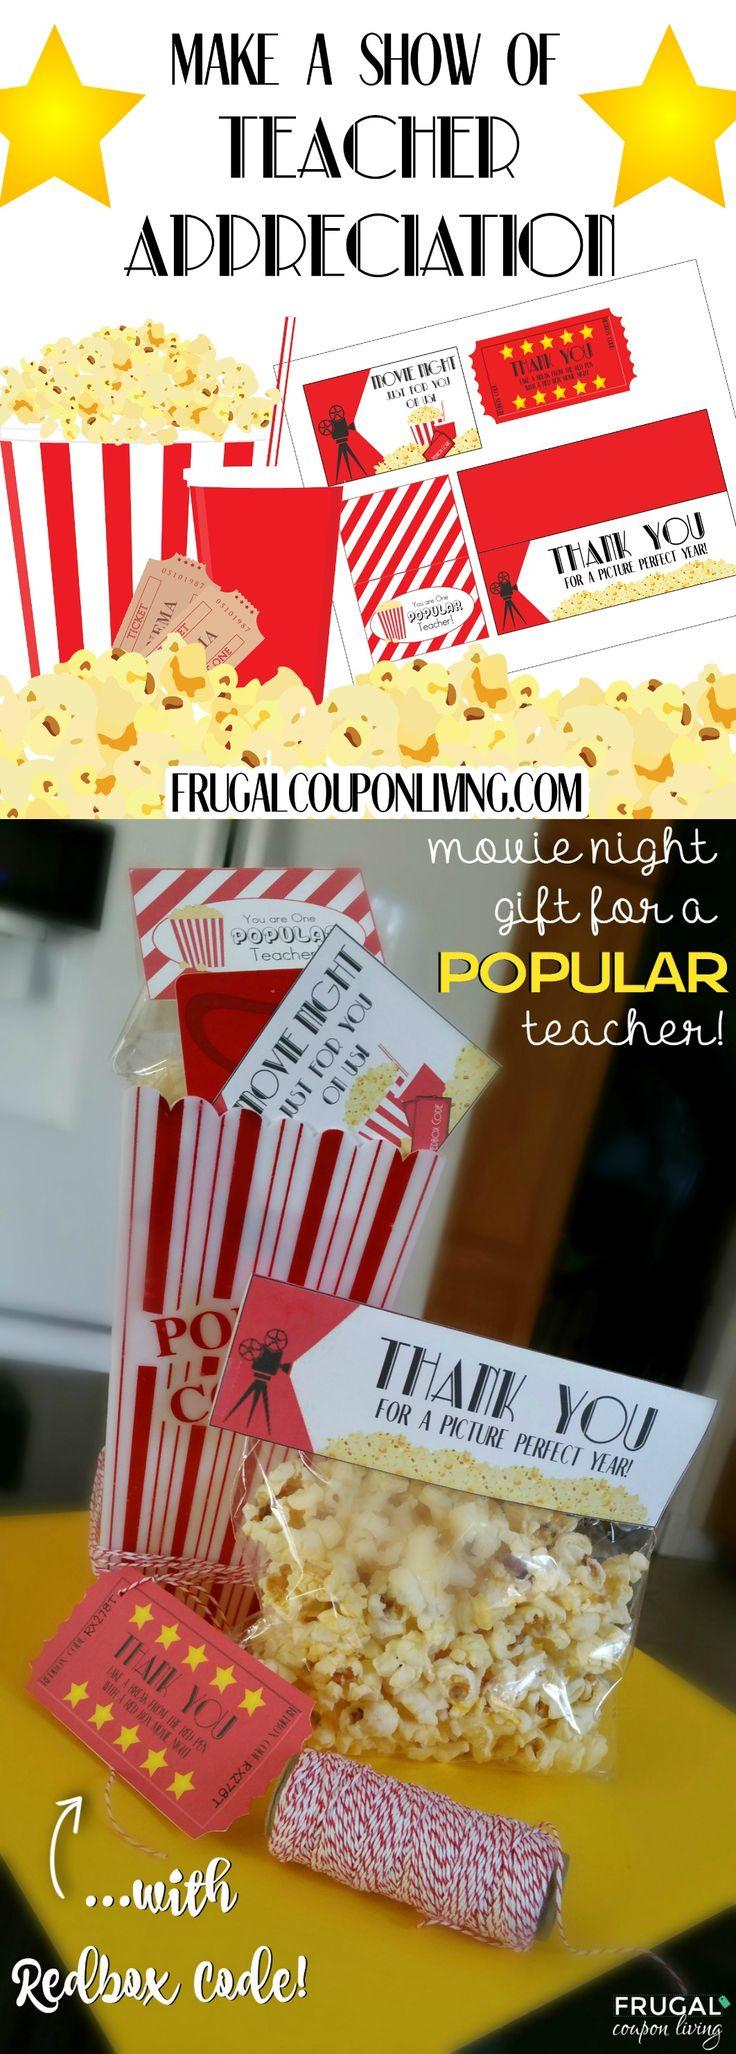 Looking for a fun way to celebrate a teacher? Print your freeMovie Night Teacher Appreciation Gift for a POPULAR teacher. Redbox Code Gift Idea.